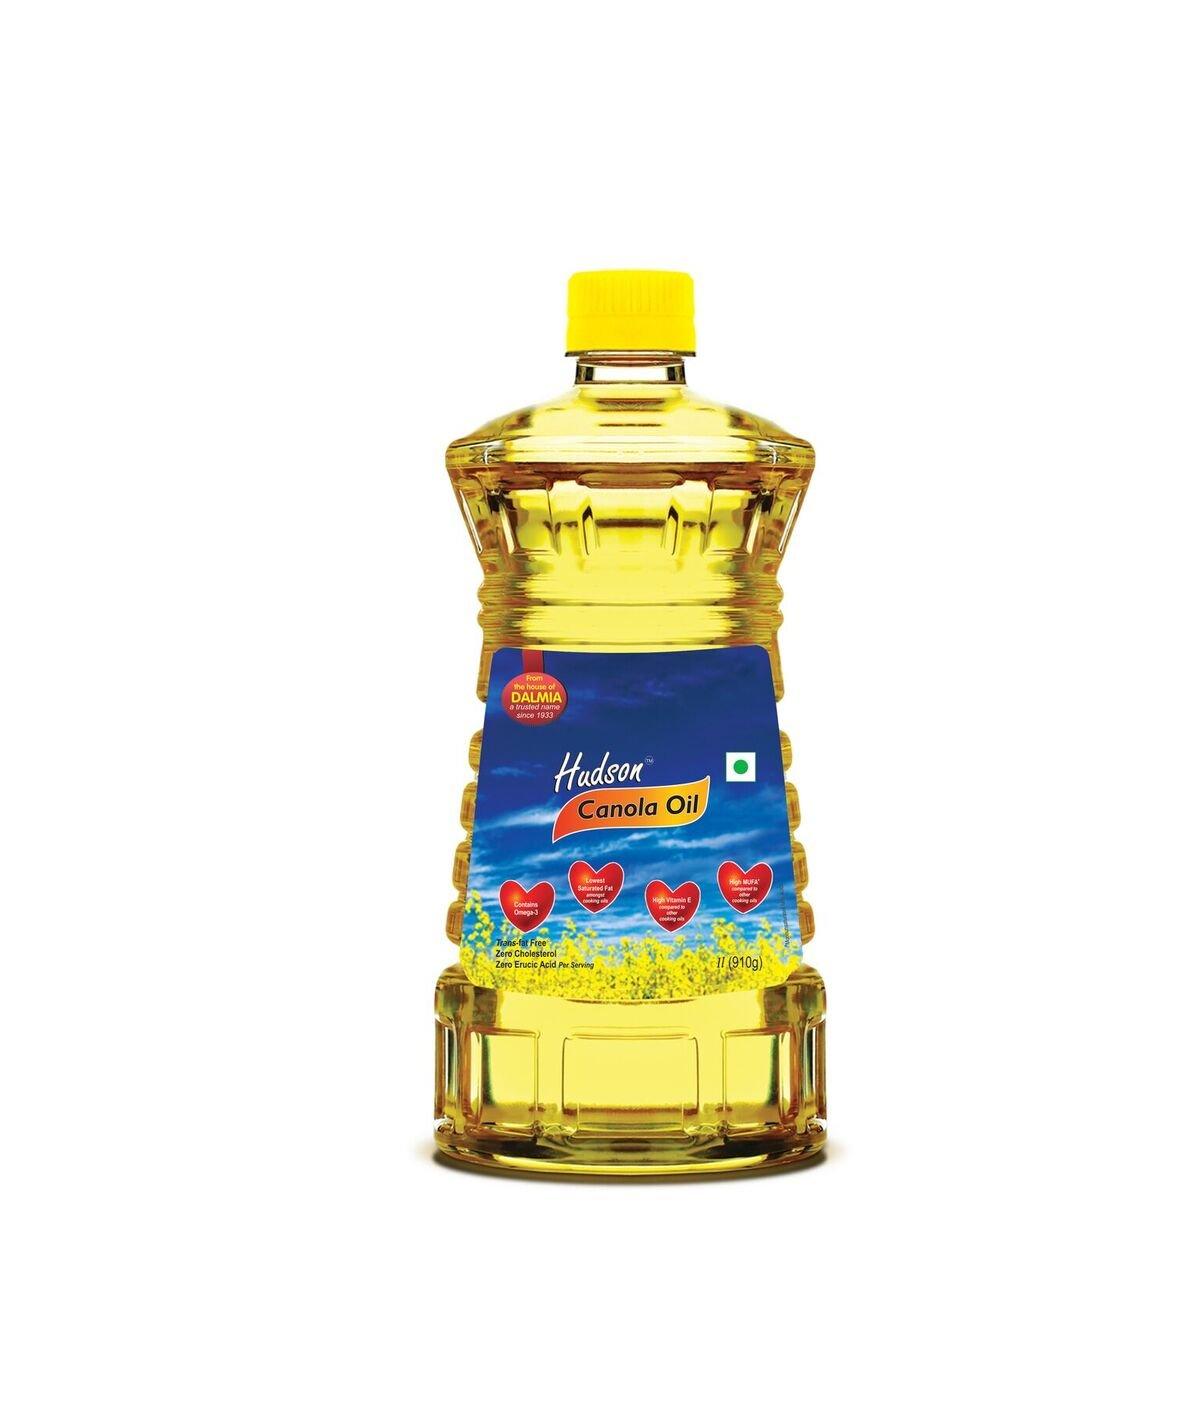 Hudson Canola Oil, 1L